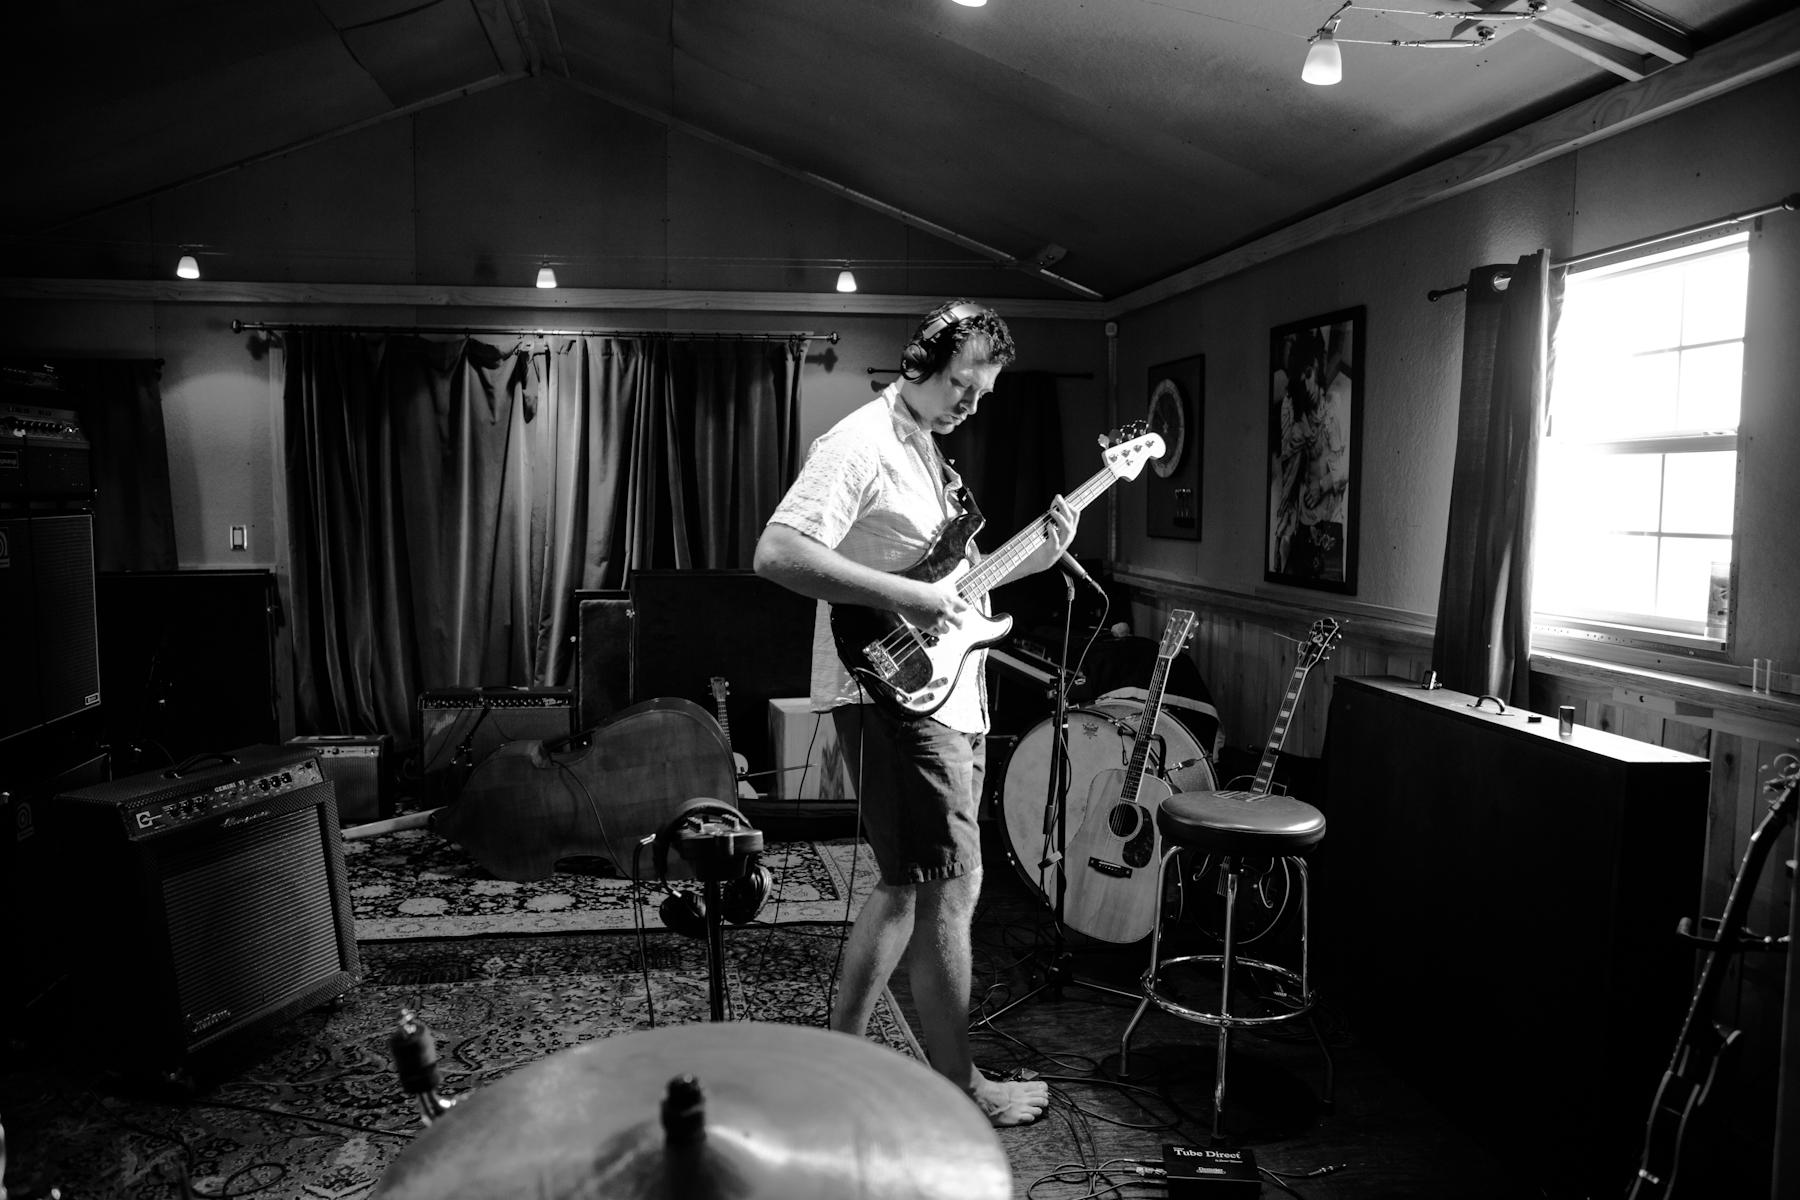 Daniel Budiansky laying down some phat bass. Rock n' Roooooolllll!